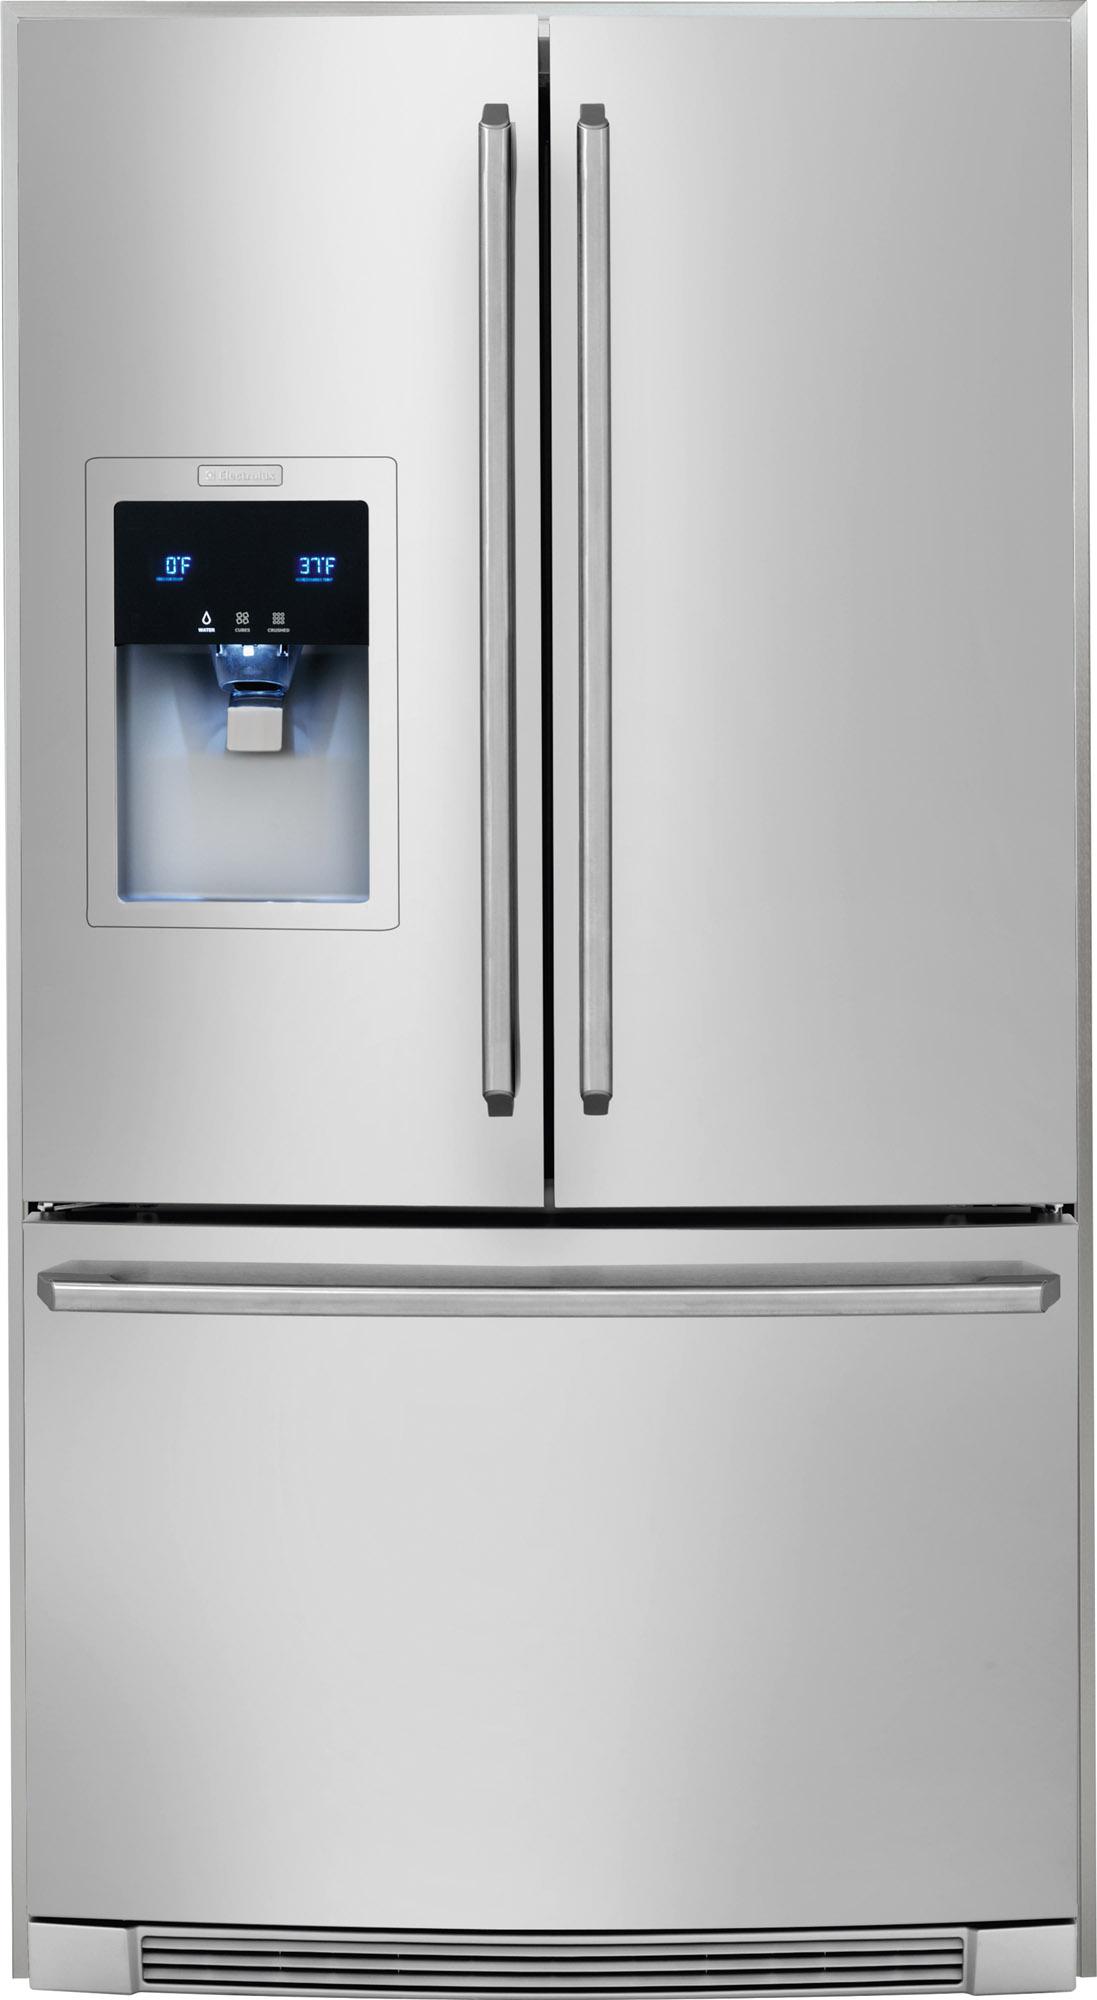 Frigidaire Refrigerator  Model Ew23bc85ks5 Parts  U0026 Repair